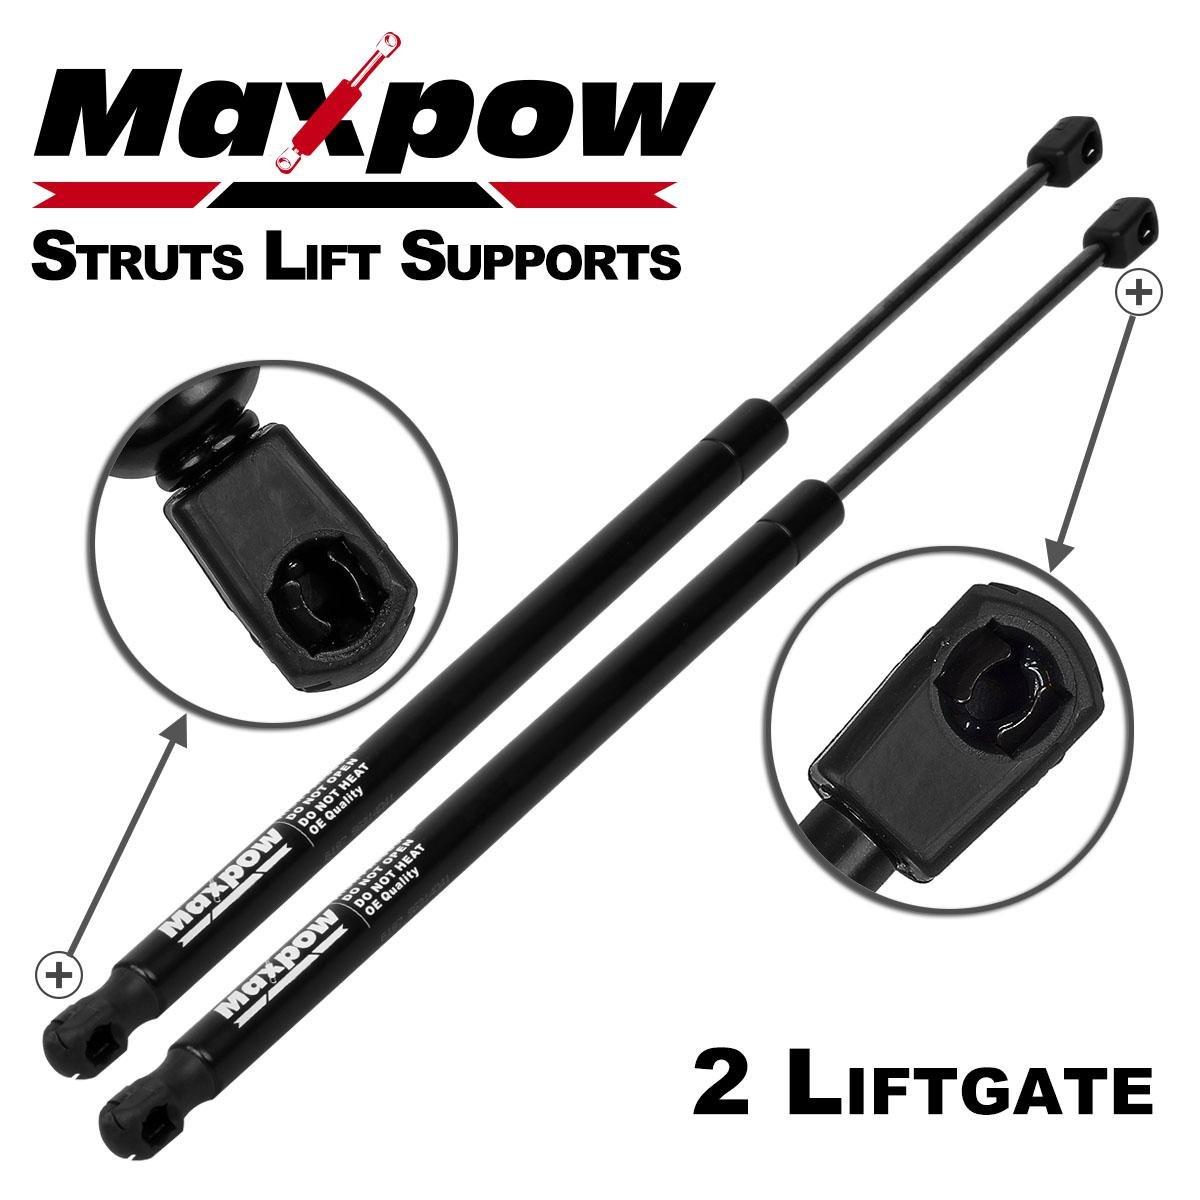 Partsam Qt2 Rear Liftgate Lift Support shocks struts Compatible With 2010 2011 2012 2013 2014 GMC Terrain SG230117